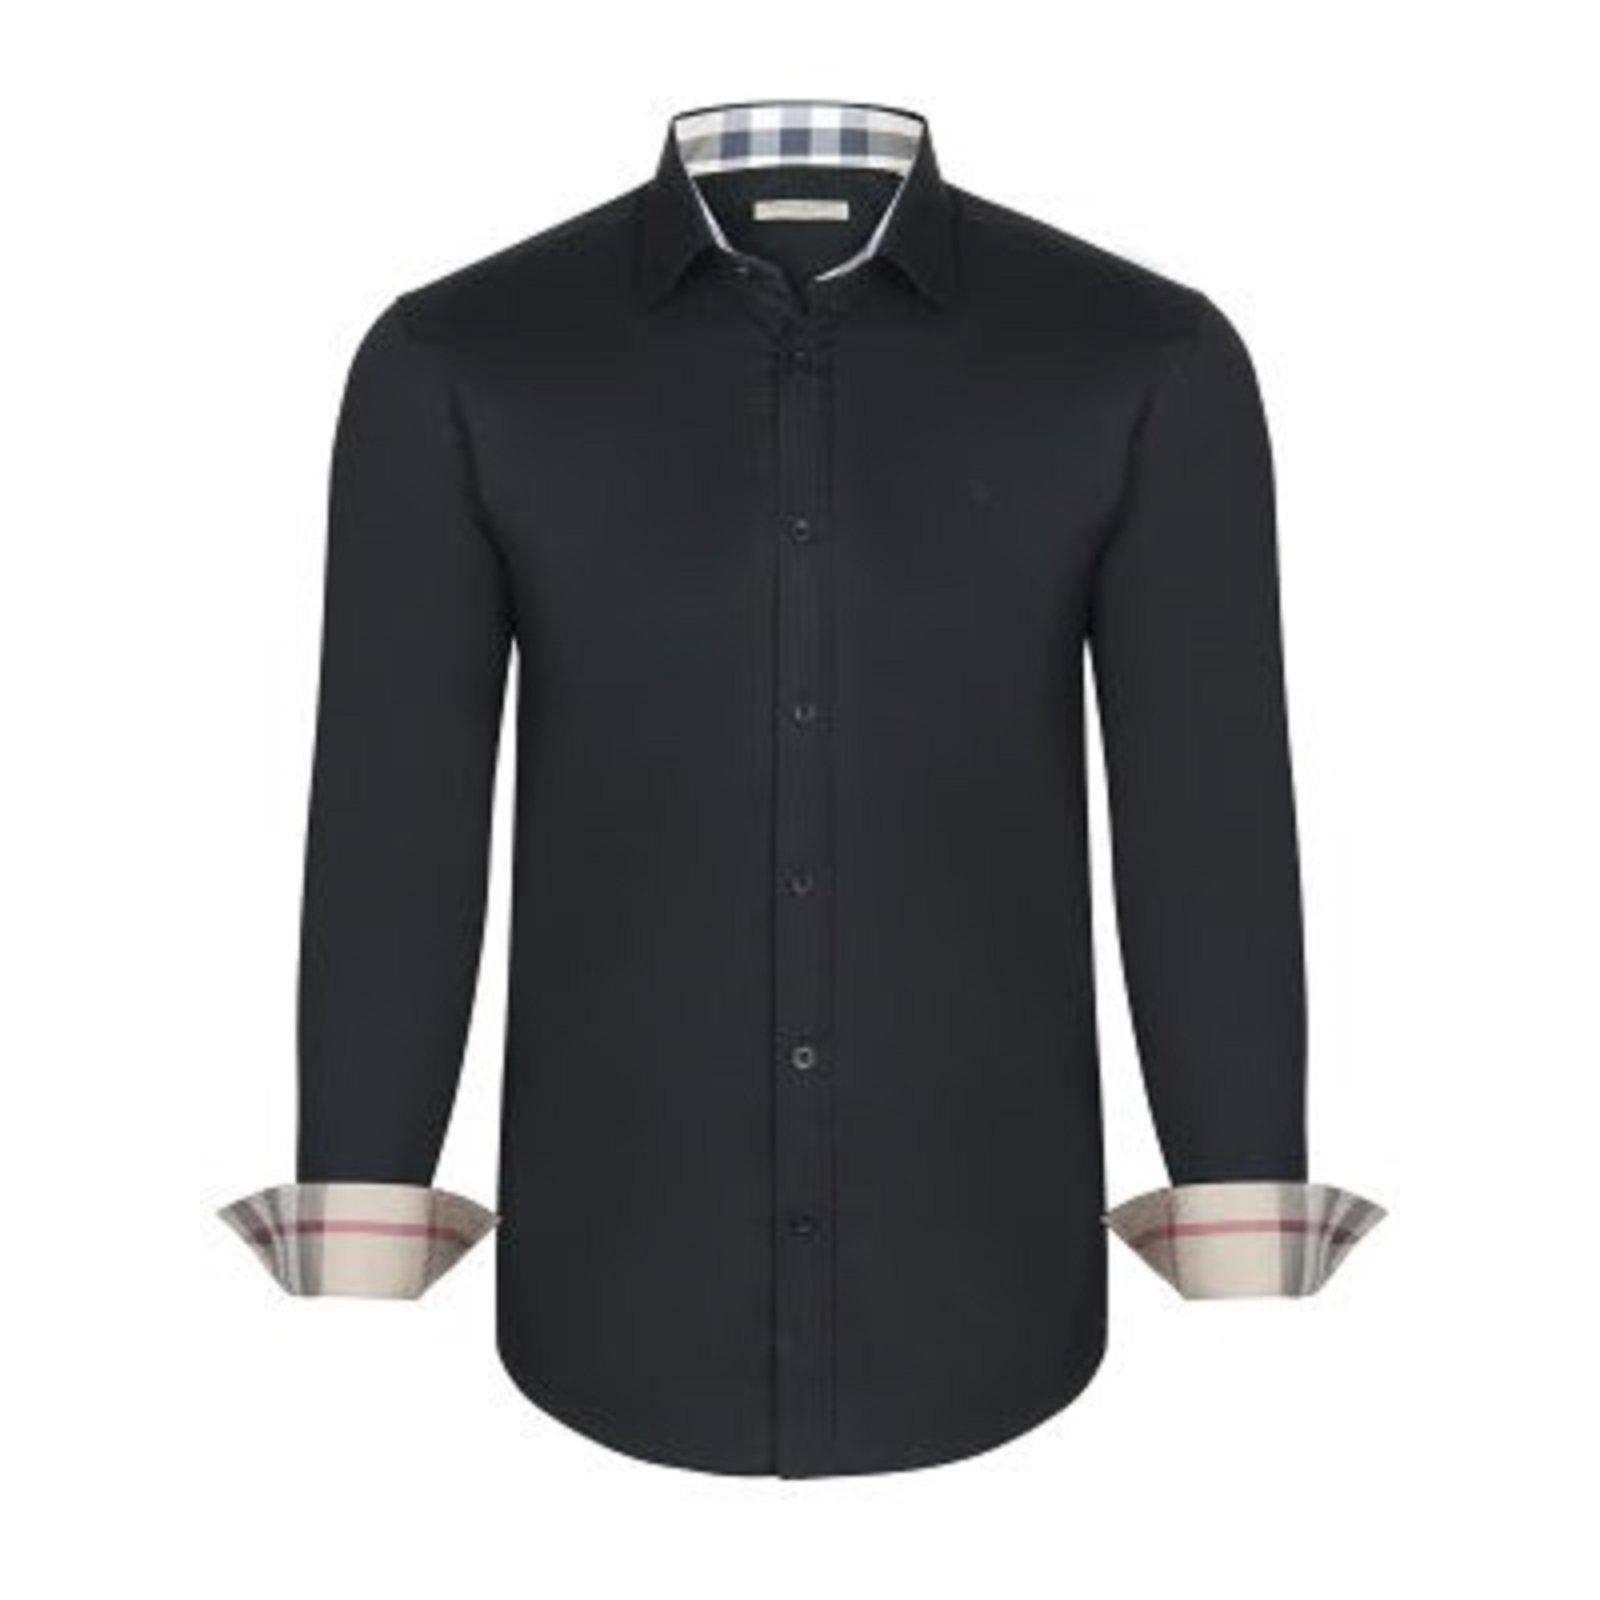 Black Burberry Dress Shirt